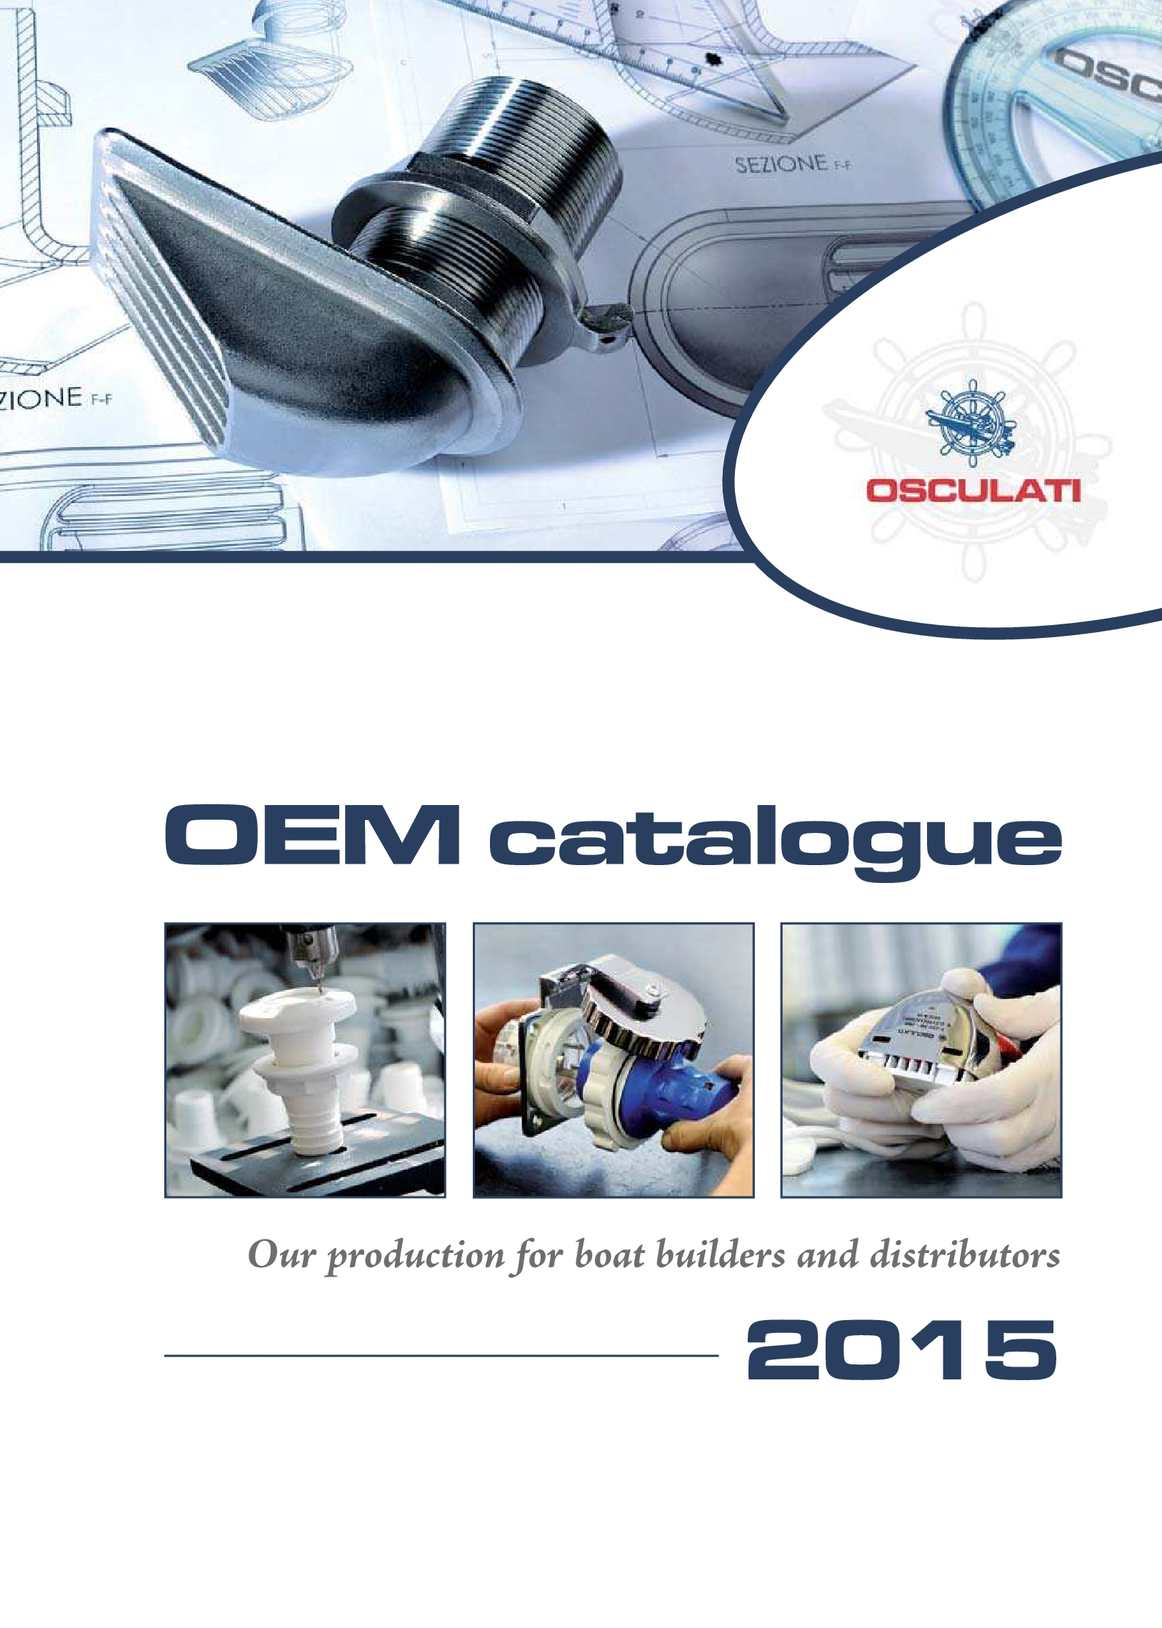 Calamo Osculati Oem Catalogue 2015 Boat Trailer Wiring Harness 01 05 5 Prong